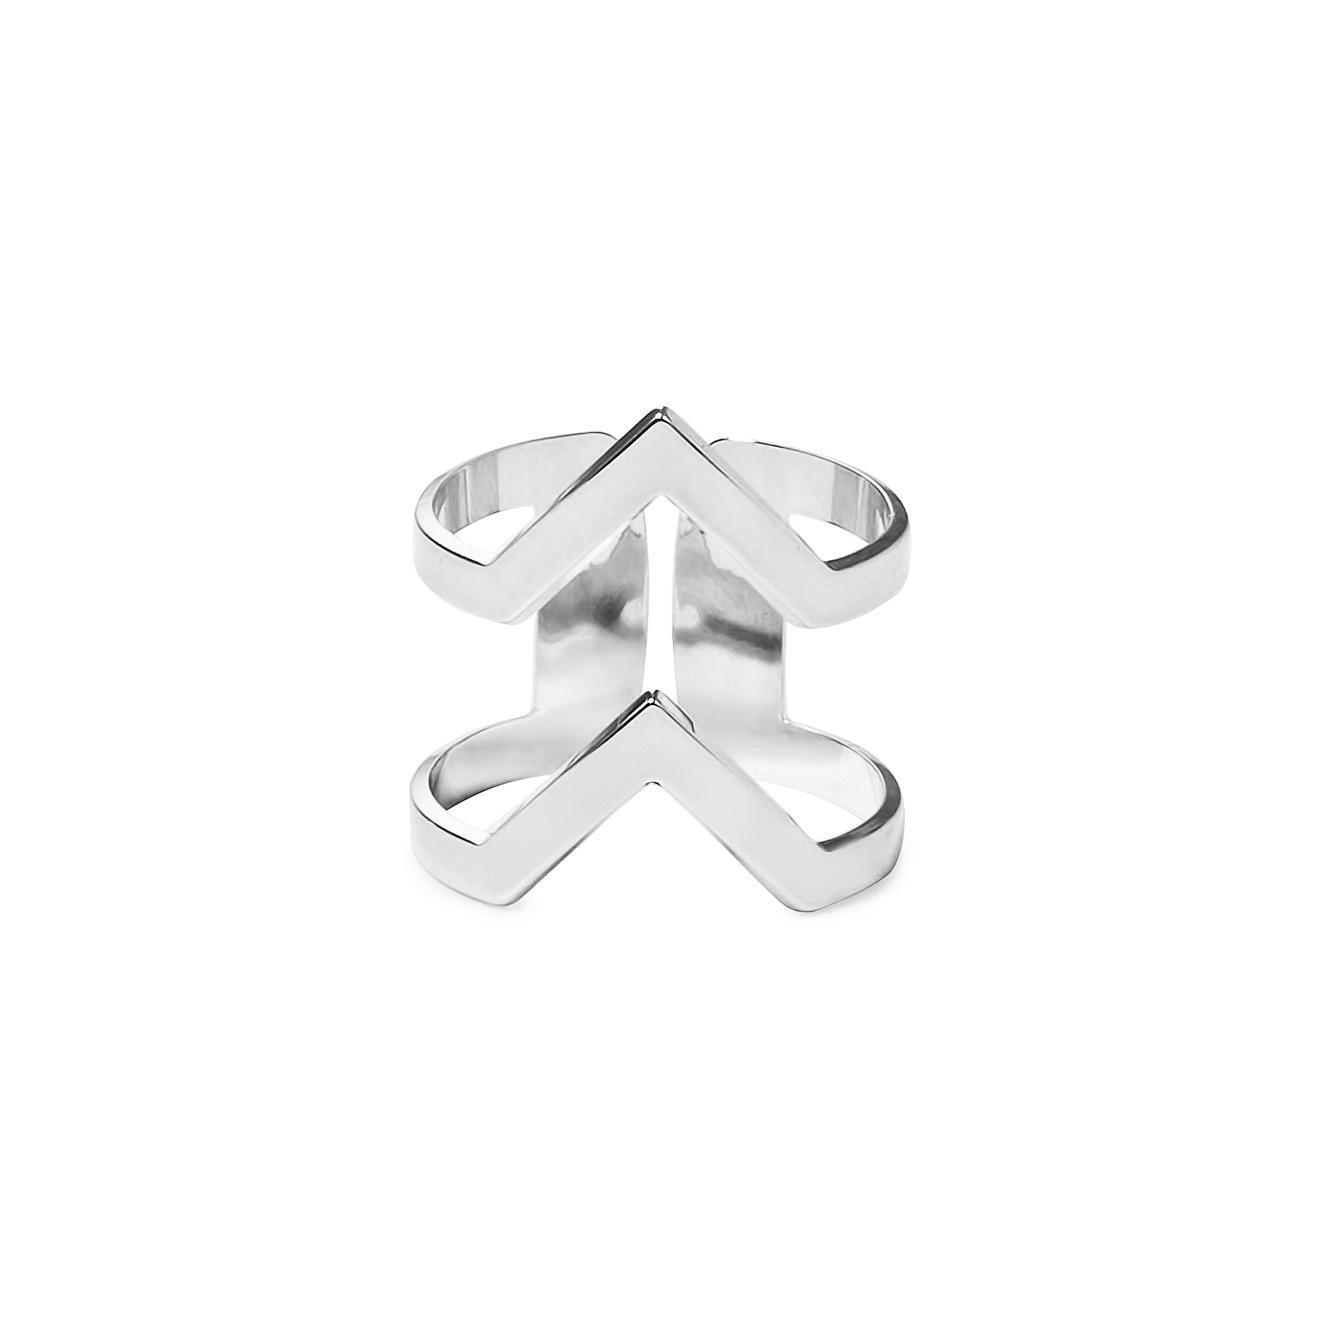 Mya Bay Покрытое серебром кольцо VV